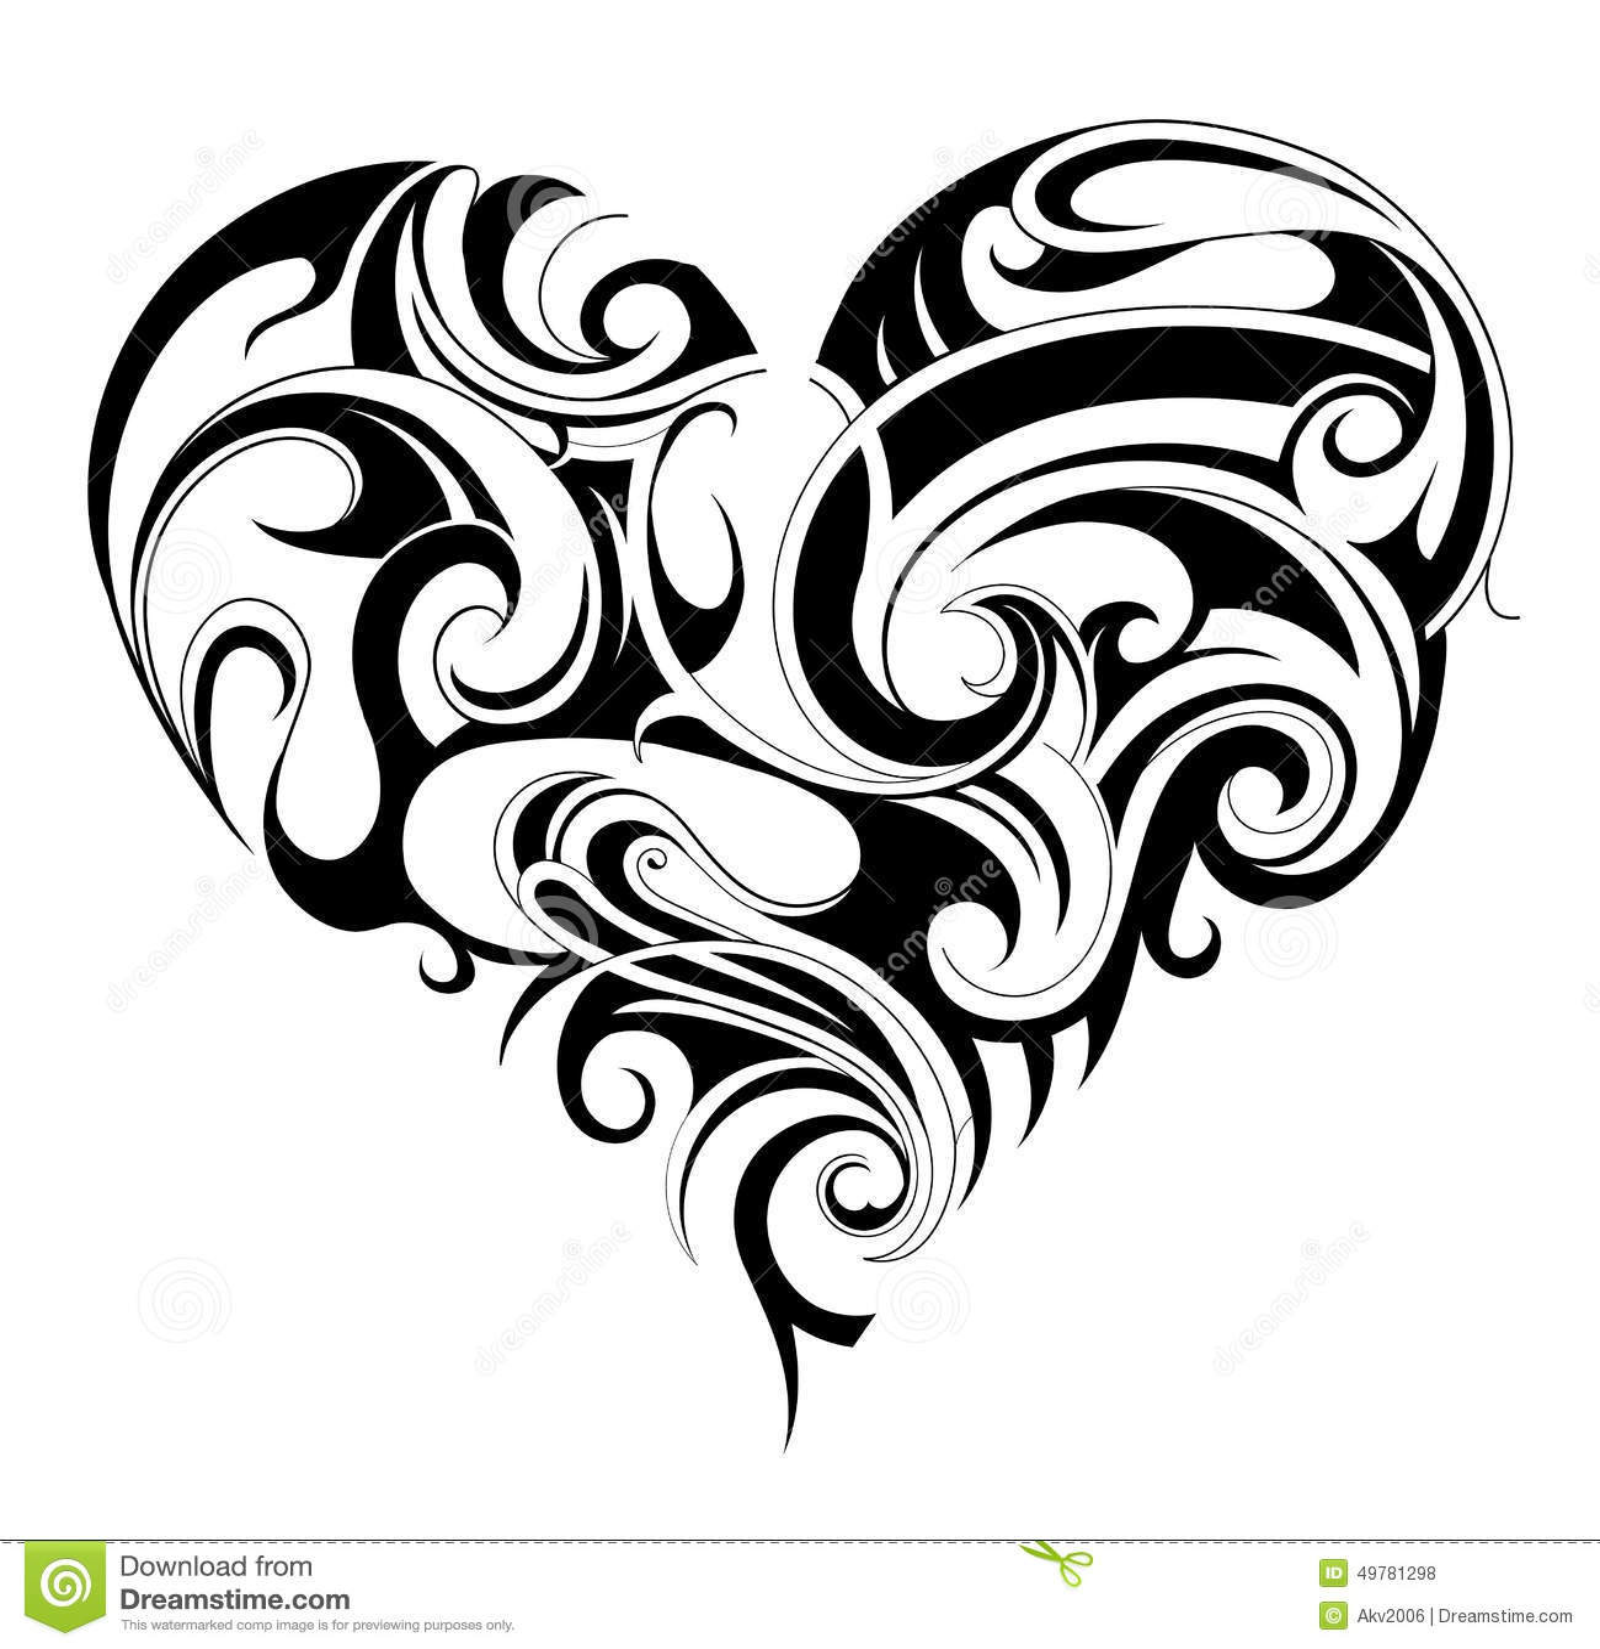 Tattoo Stock Photos: Heart Shape Tattoo Stock Vector. Illustration Of Valentine